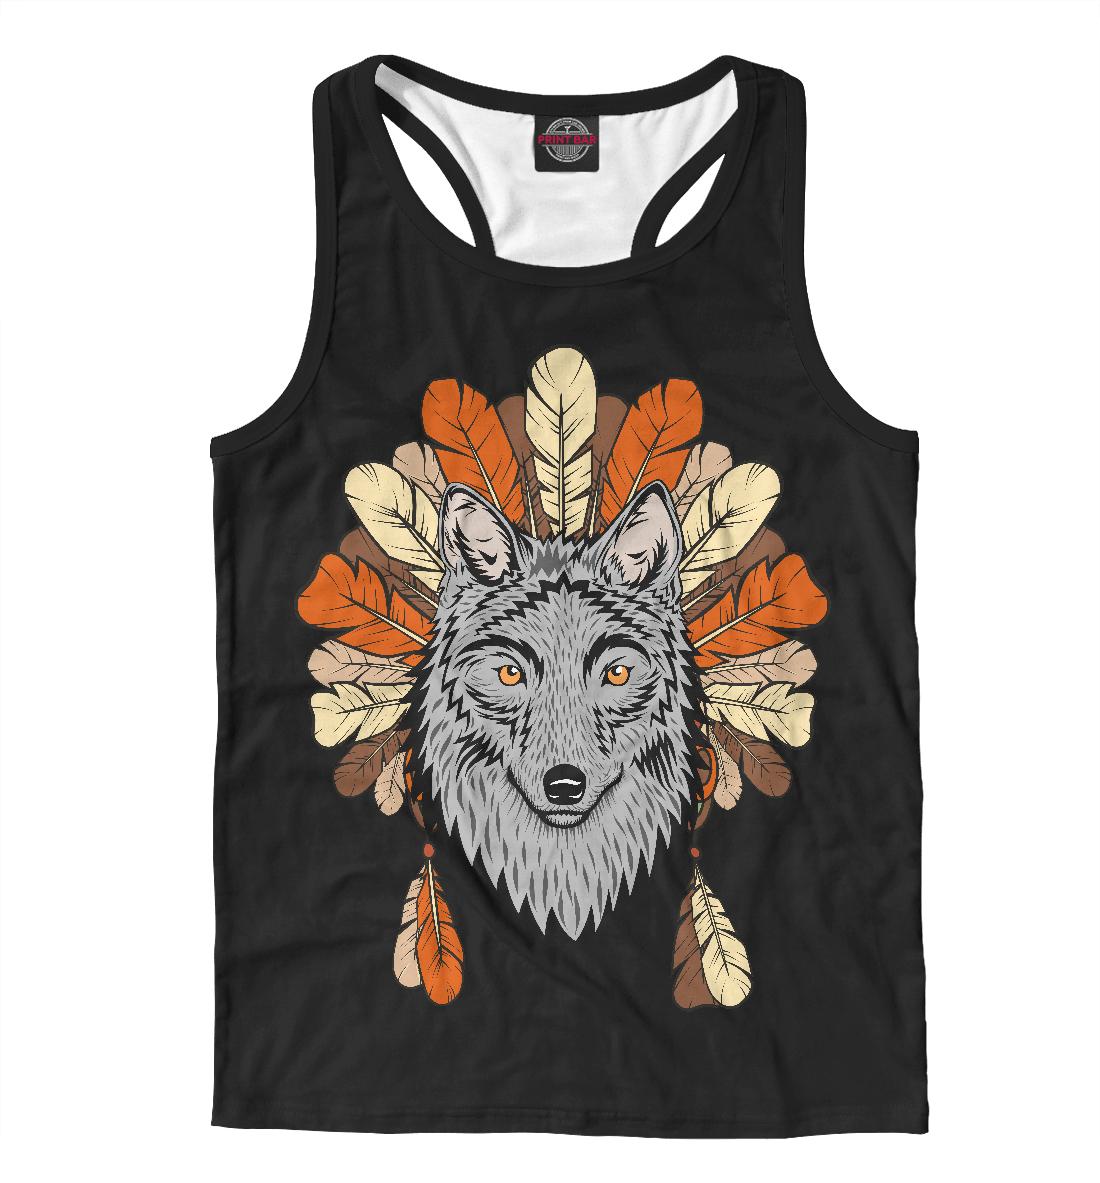 Купить Волк индеец, Printbar, Майки борцовки, VLF-582521-mayb-2